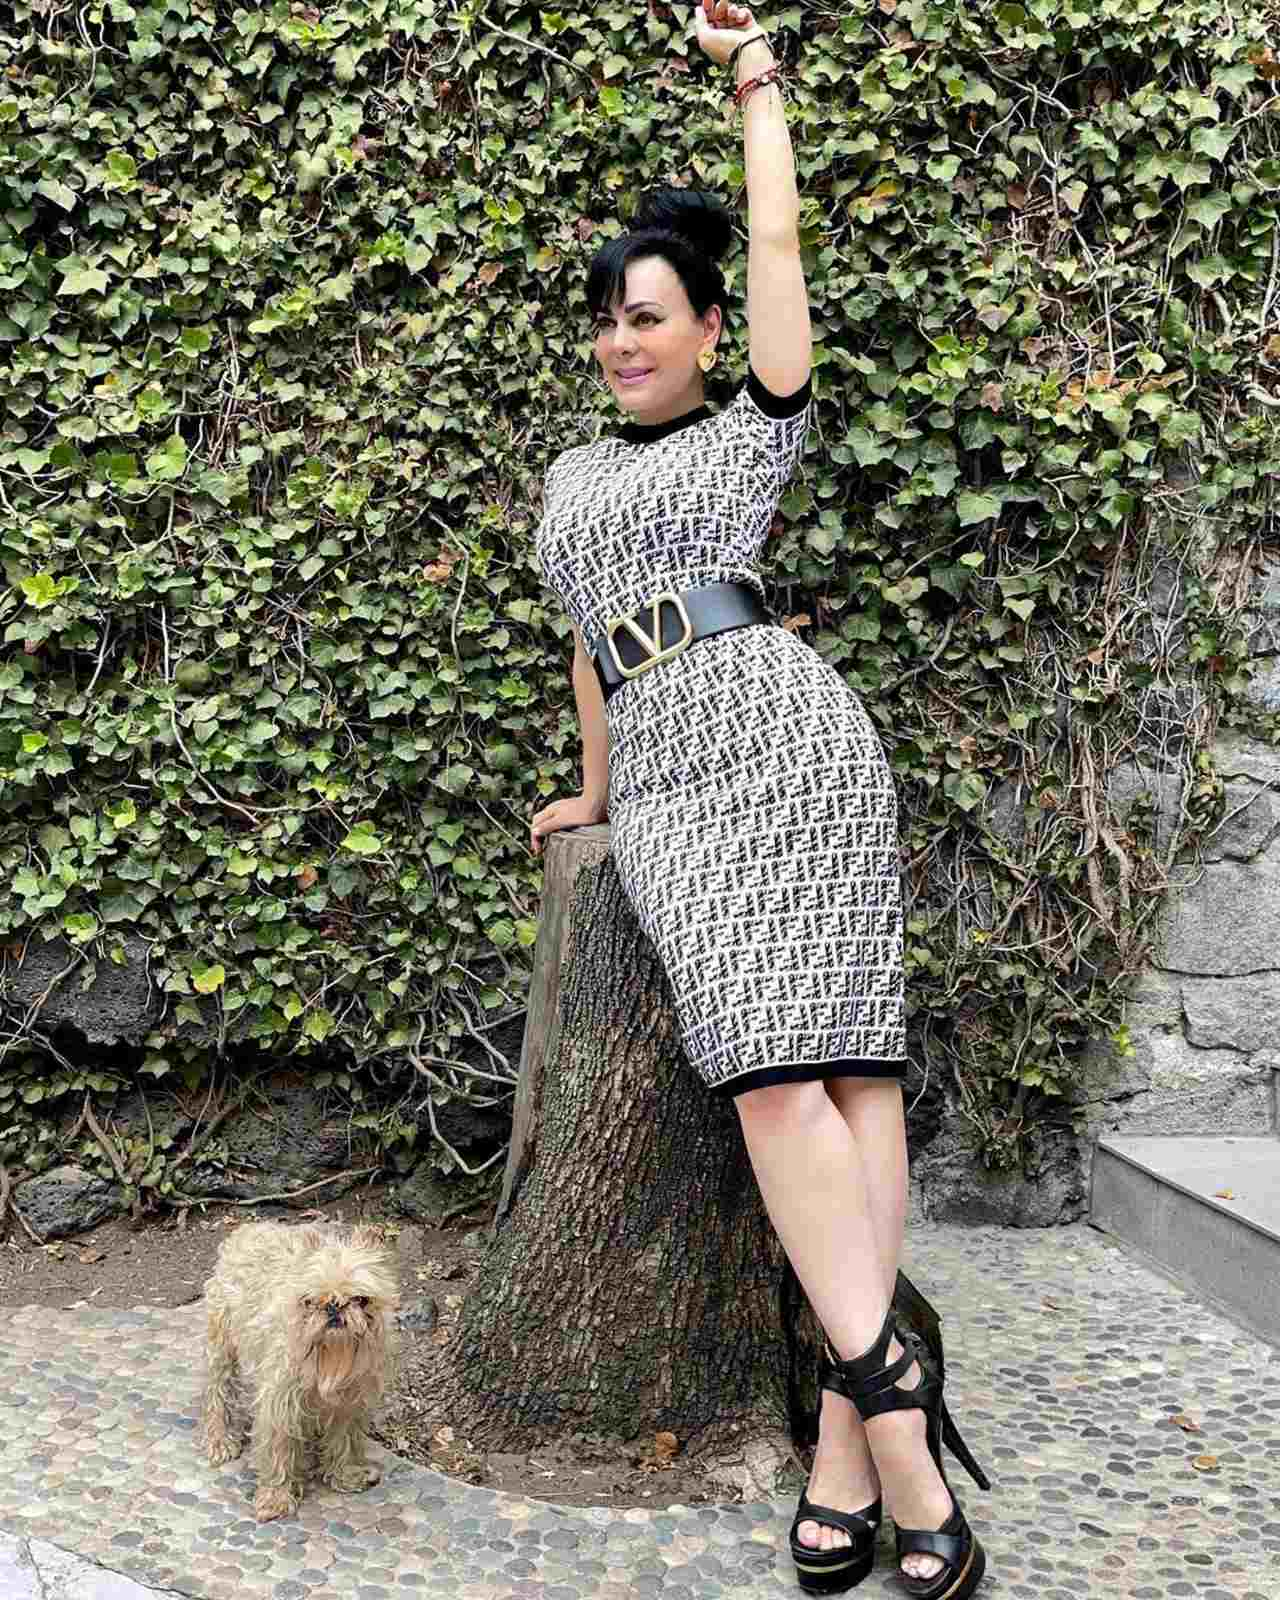 Critican Maribel Guardia perro mugroso